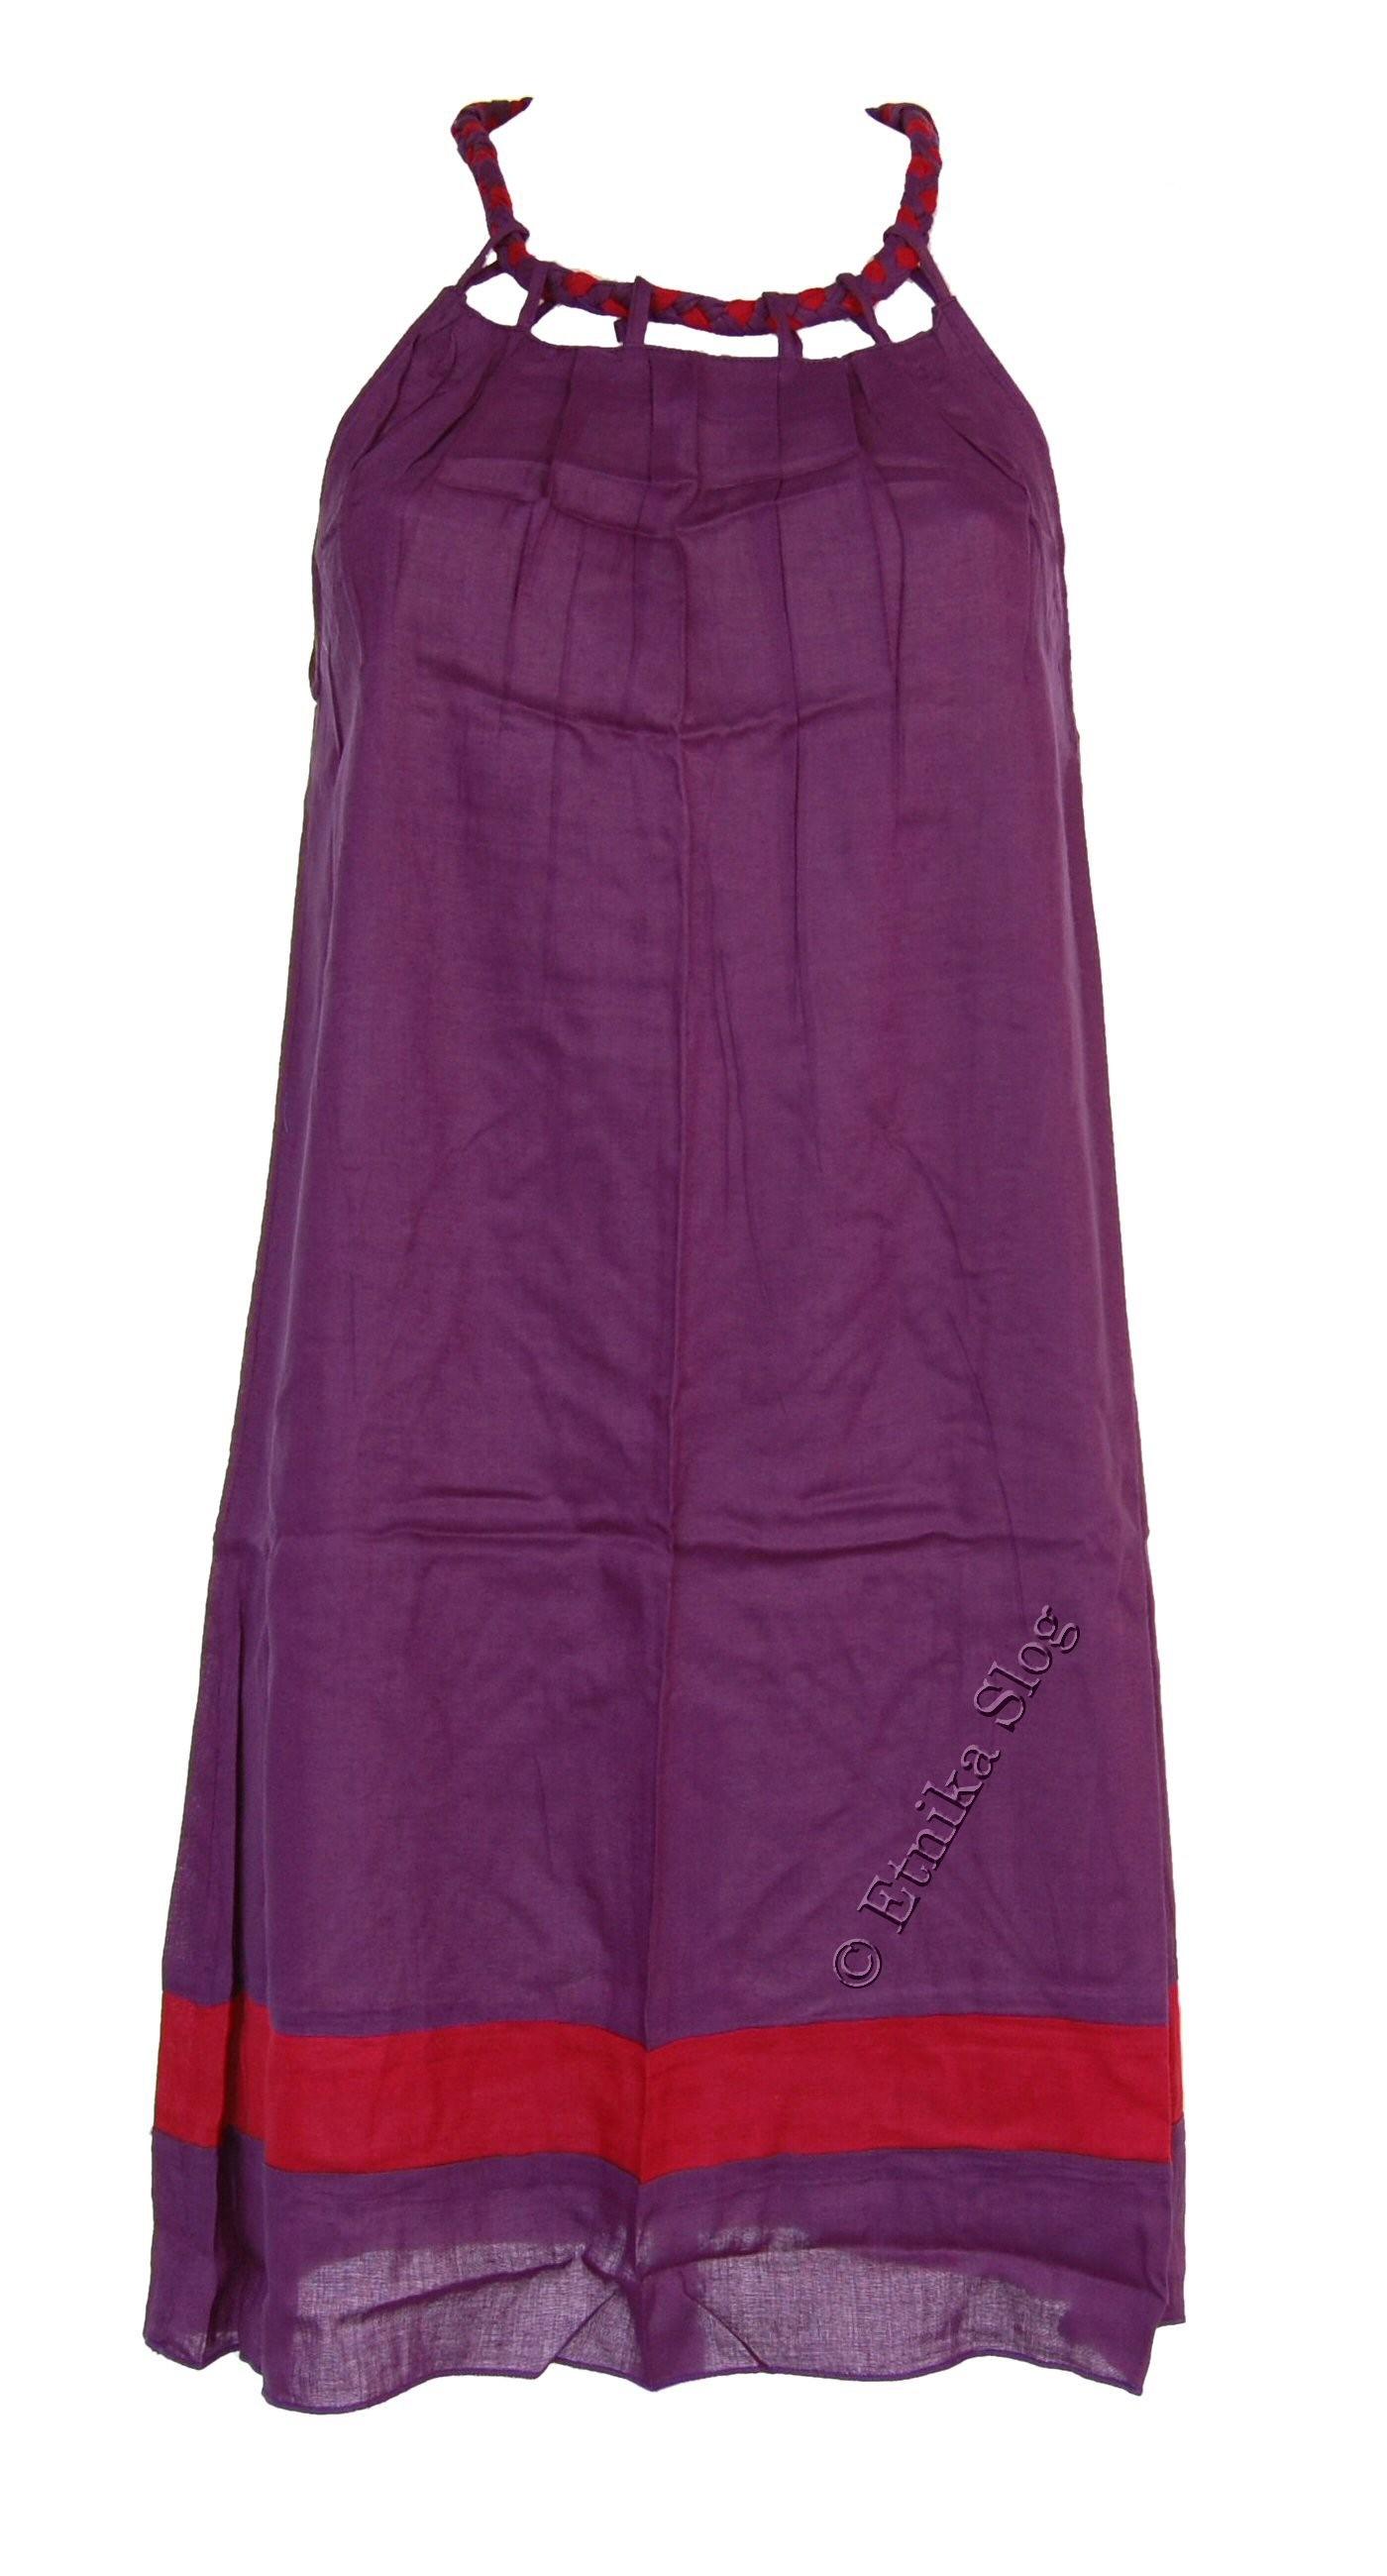 VISCOSE SUMMER DRESSES AB-AJV27 - Oriente Import S.r.l.